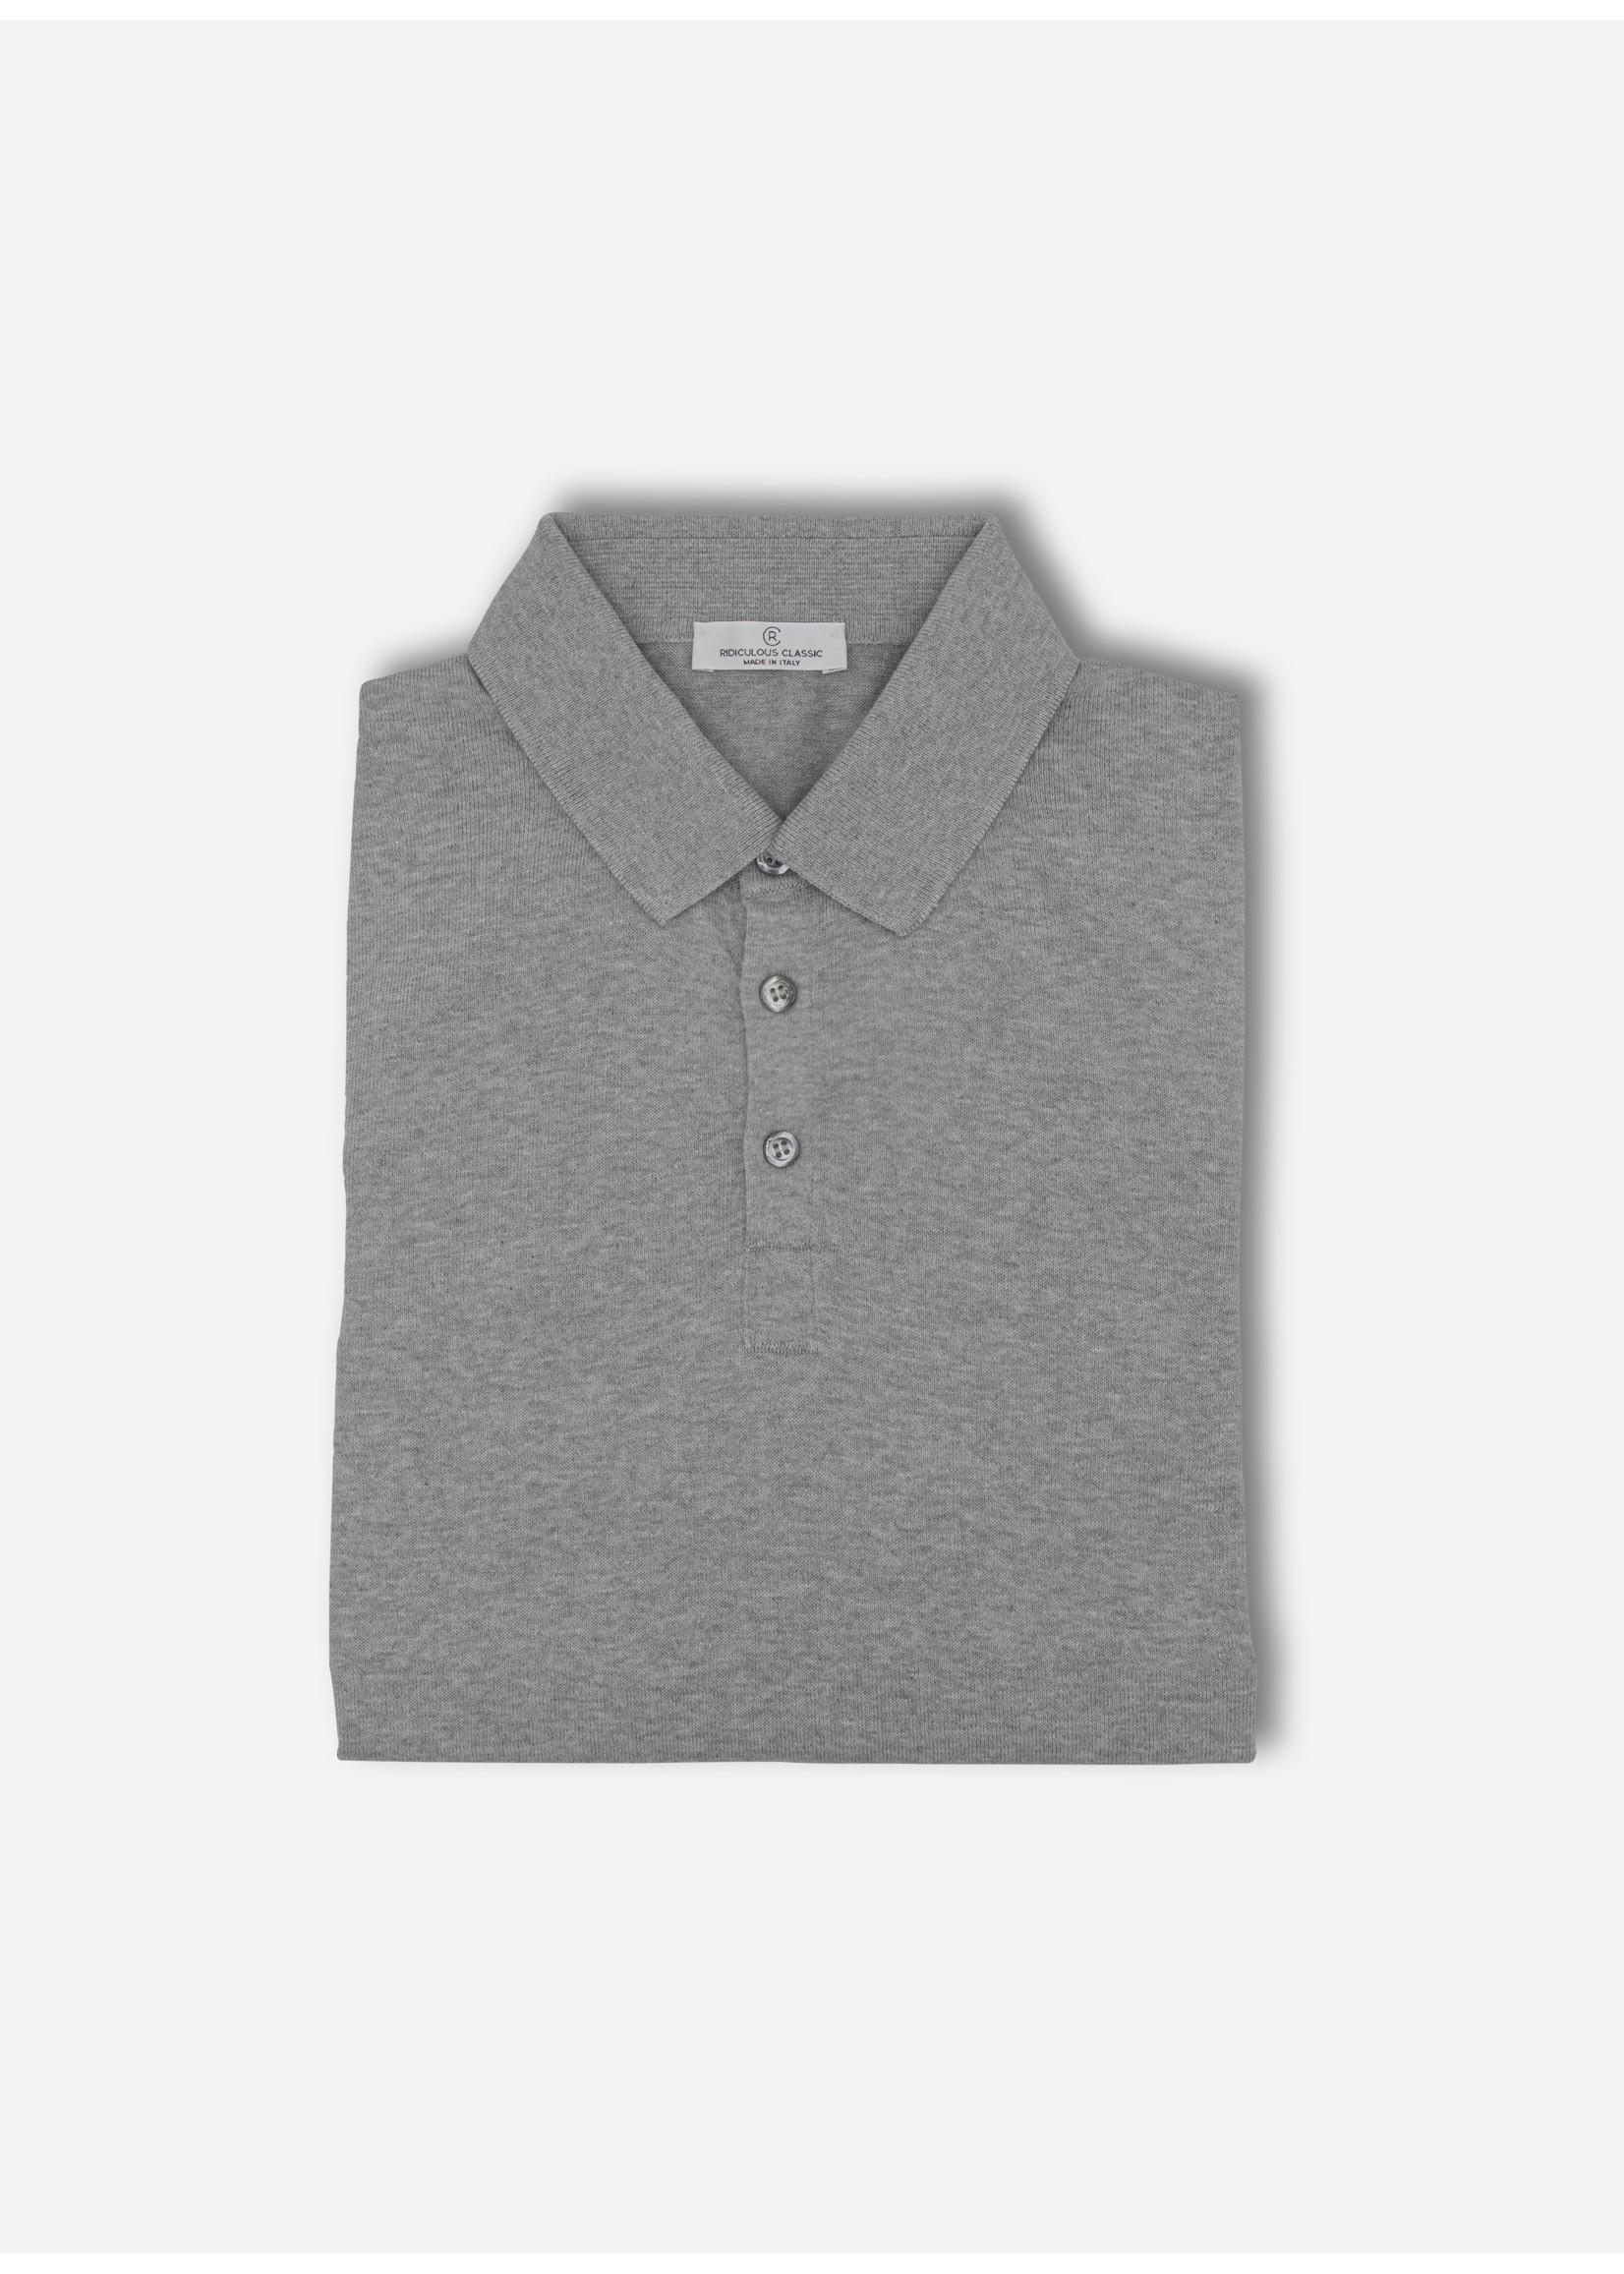 Ridiculous Classic Polo shirt grey tennis